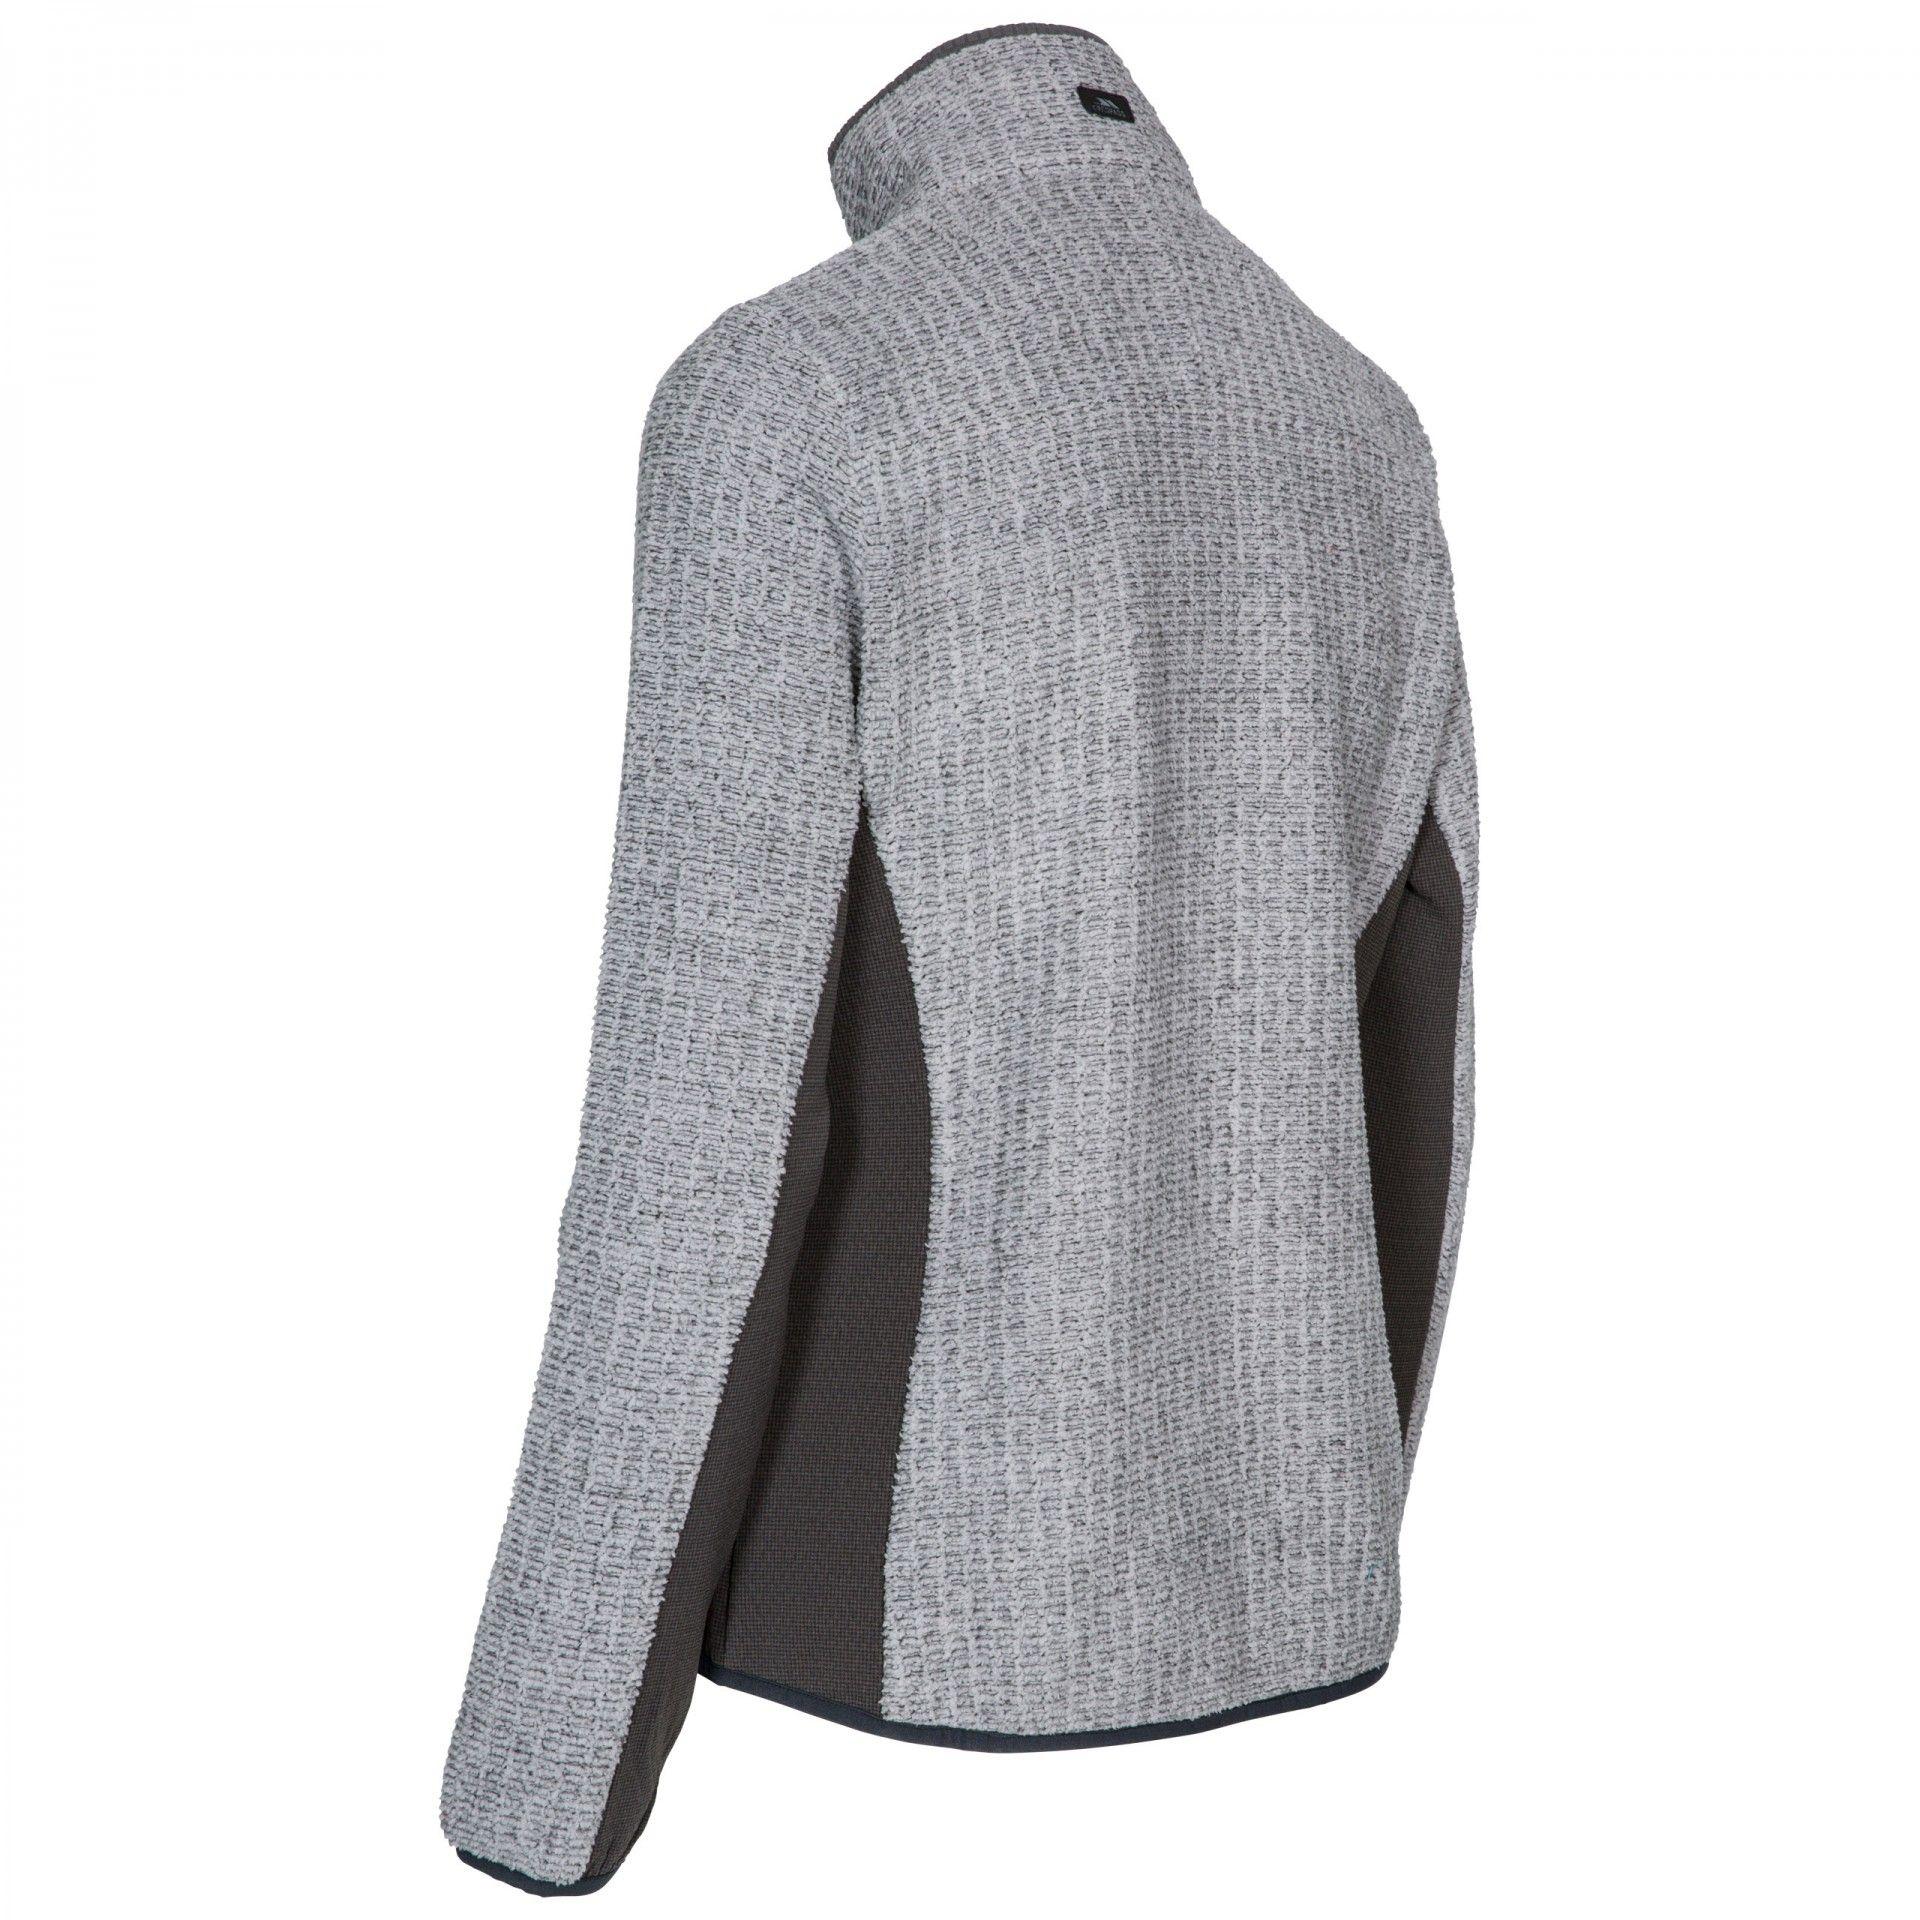 Trespass Womens/Ladies Liggins Fleece Jacket